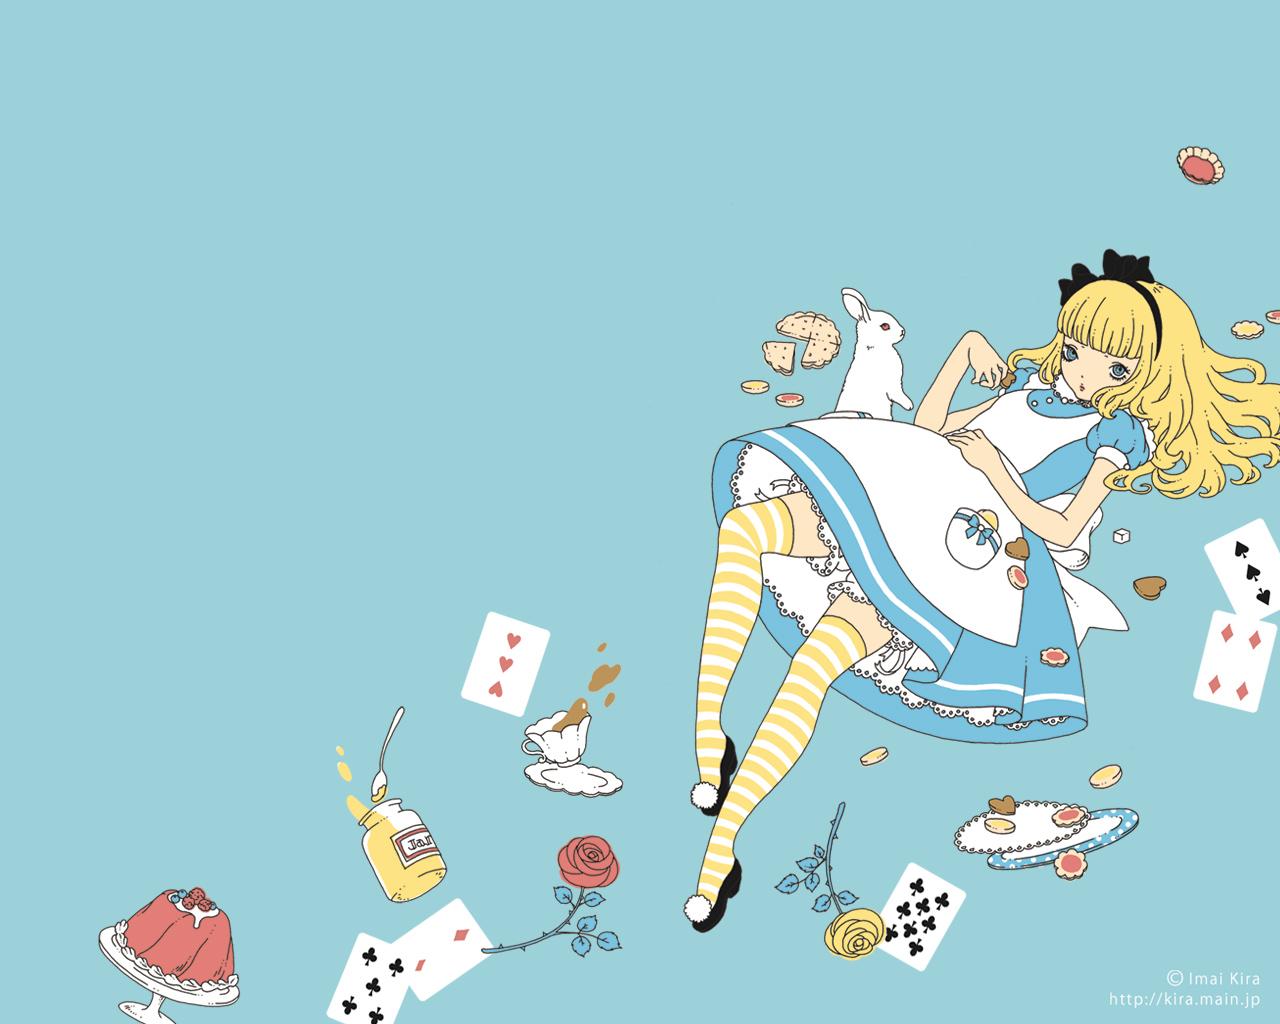 alice_(wonderland) alice_in_wonderland blonde_hair blue blue_eyes bunny dress food lolita_fashion